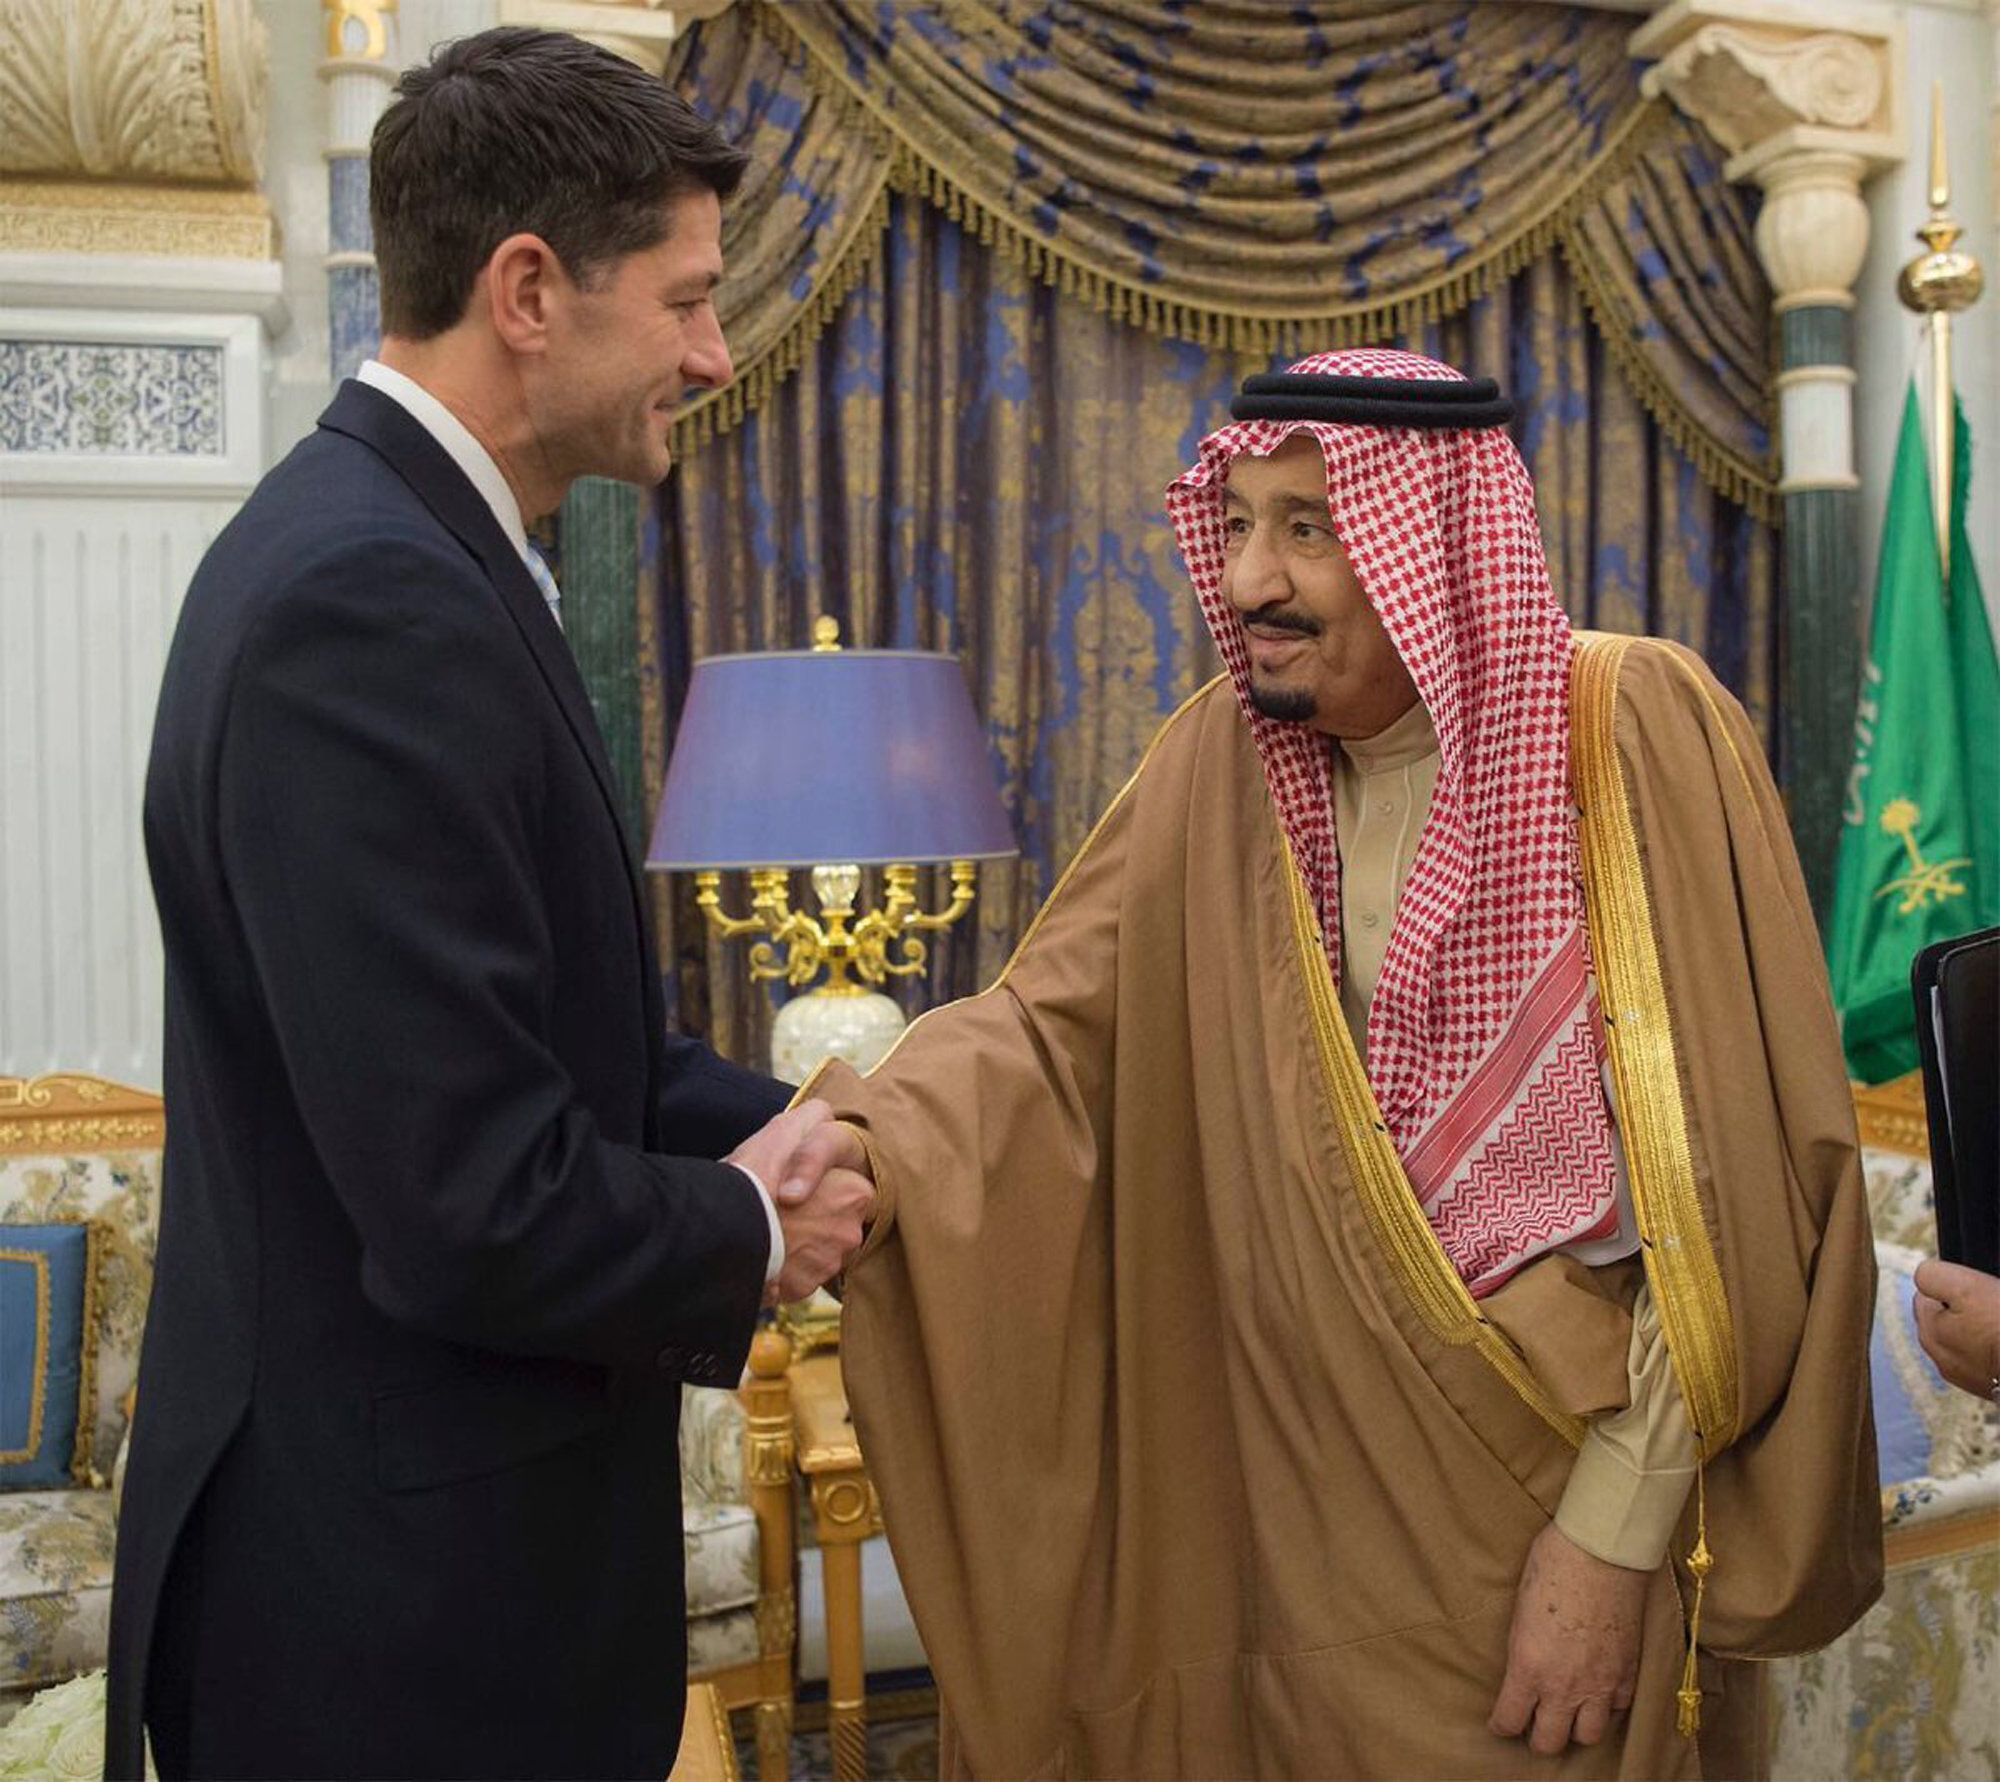 House Speaker Paul Ryan and Saudi King Salman in Riyadh, Saudi Arabia, on Jan. 24. Republican leaders in the House of Represe